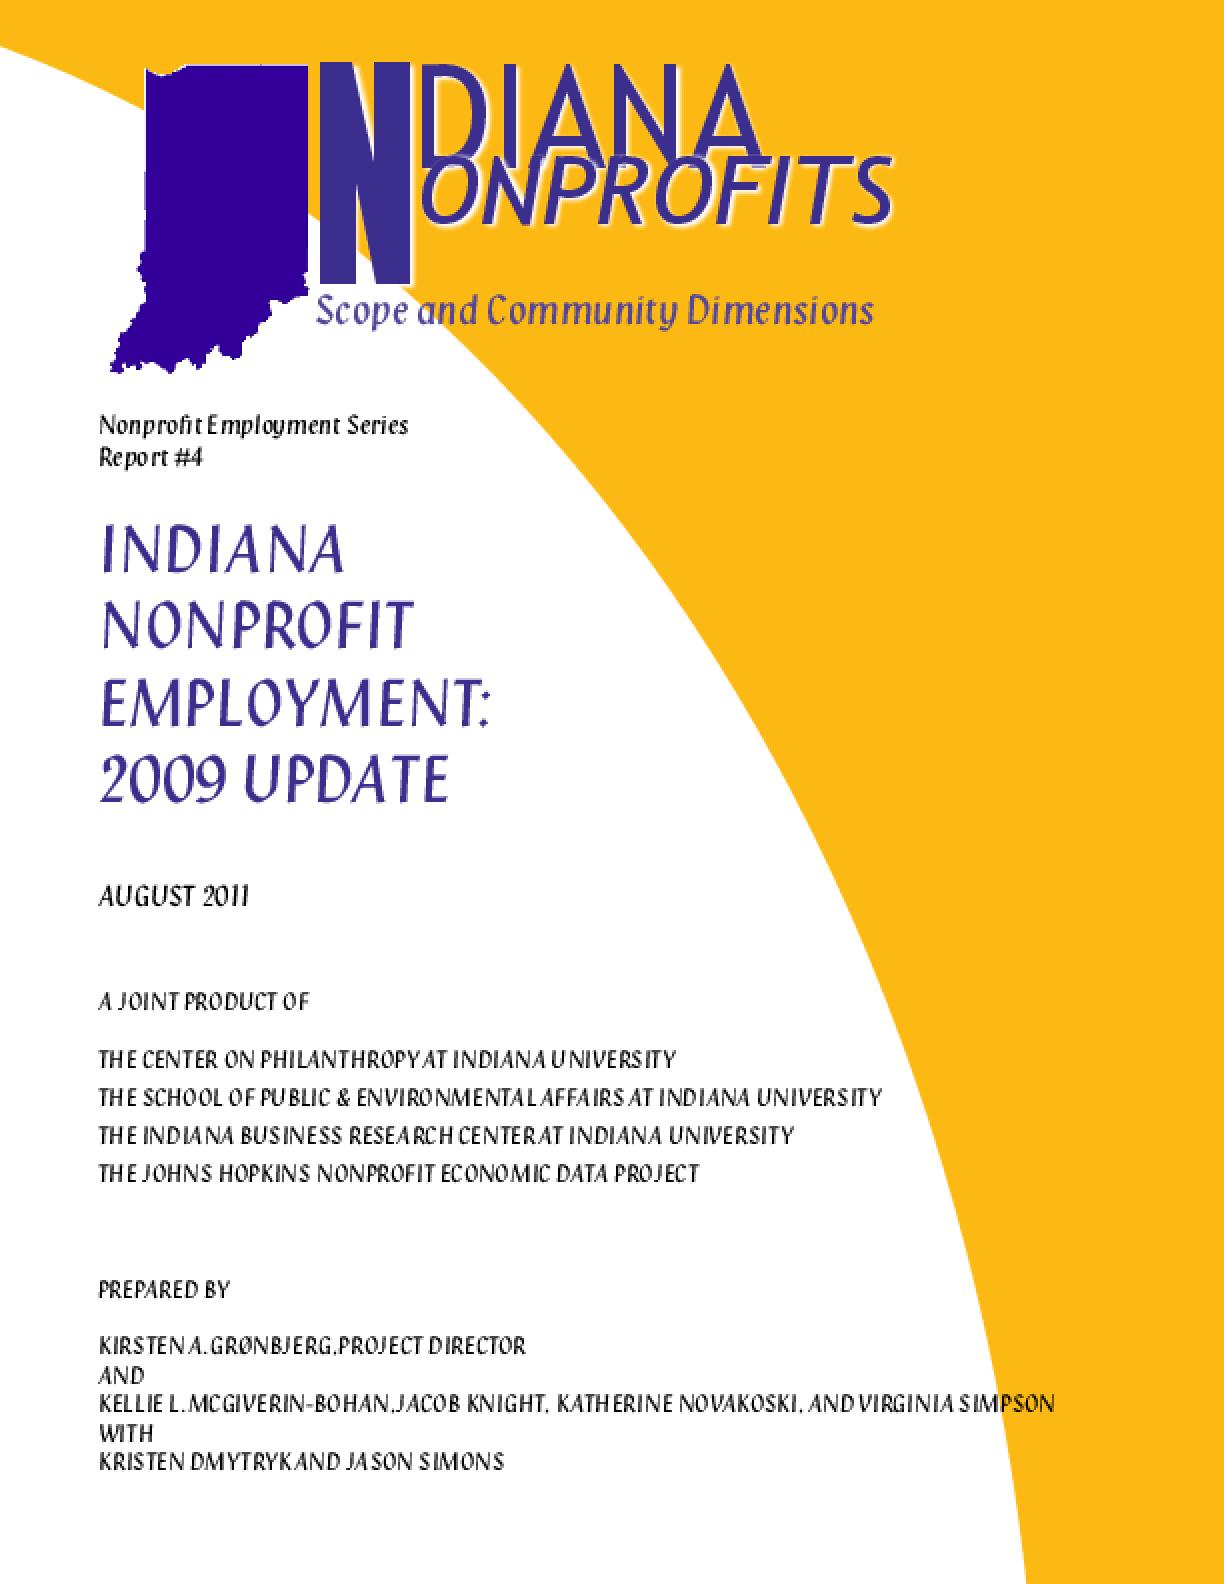 Indiana Nonprofit Employment: 2009 Update